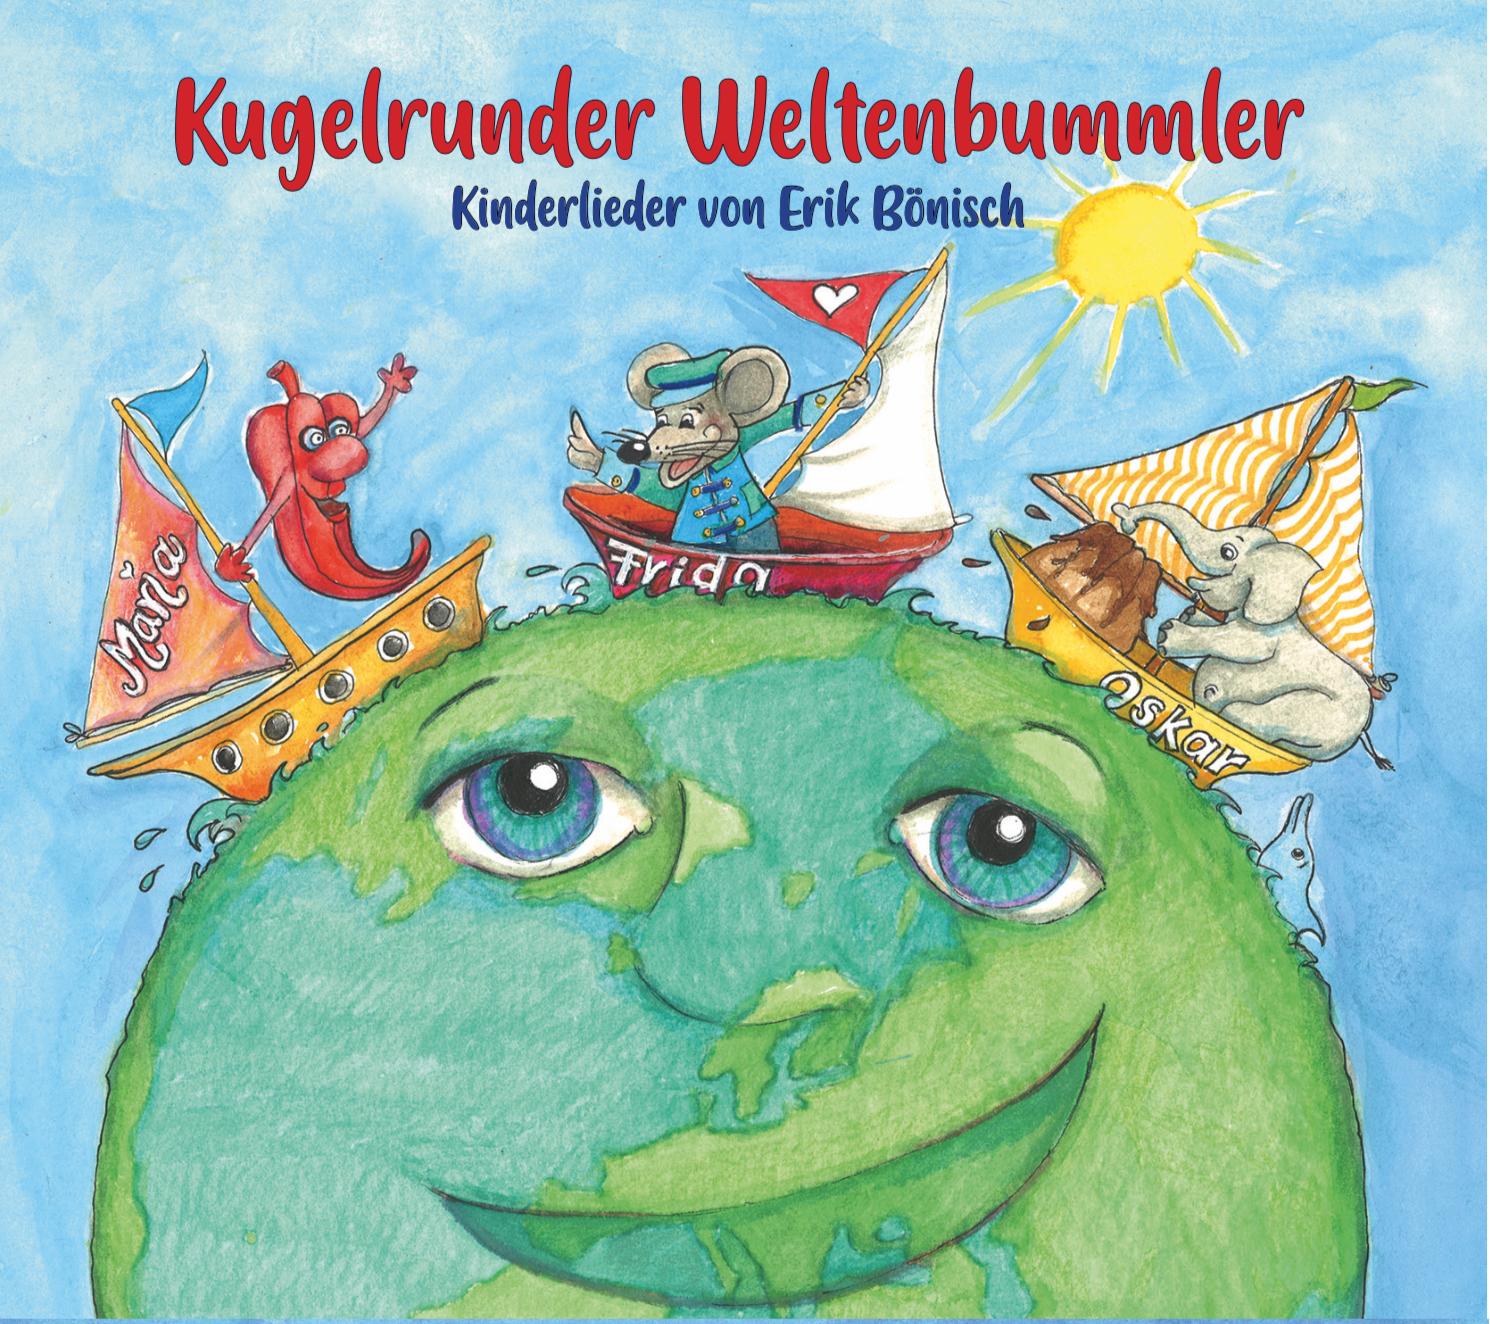 Kugelrunder Weltenbummler (CD)